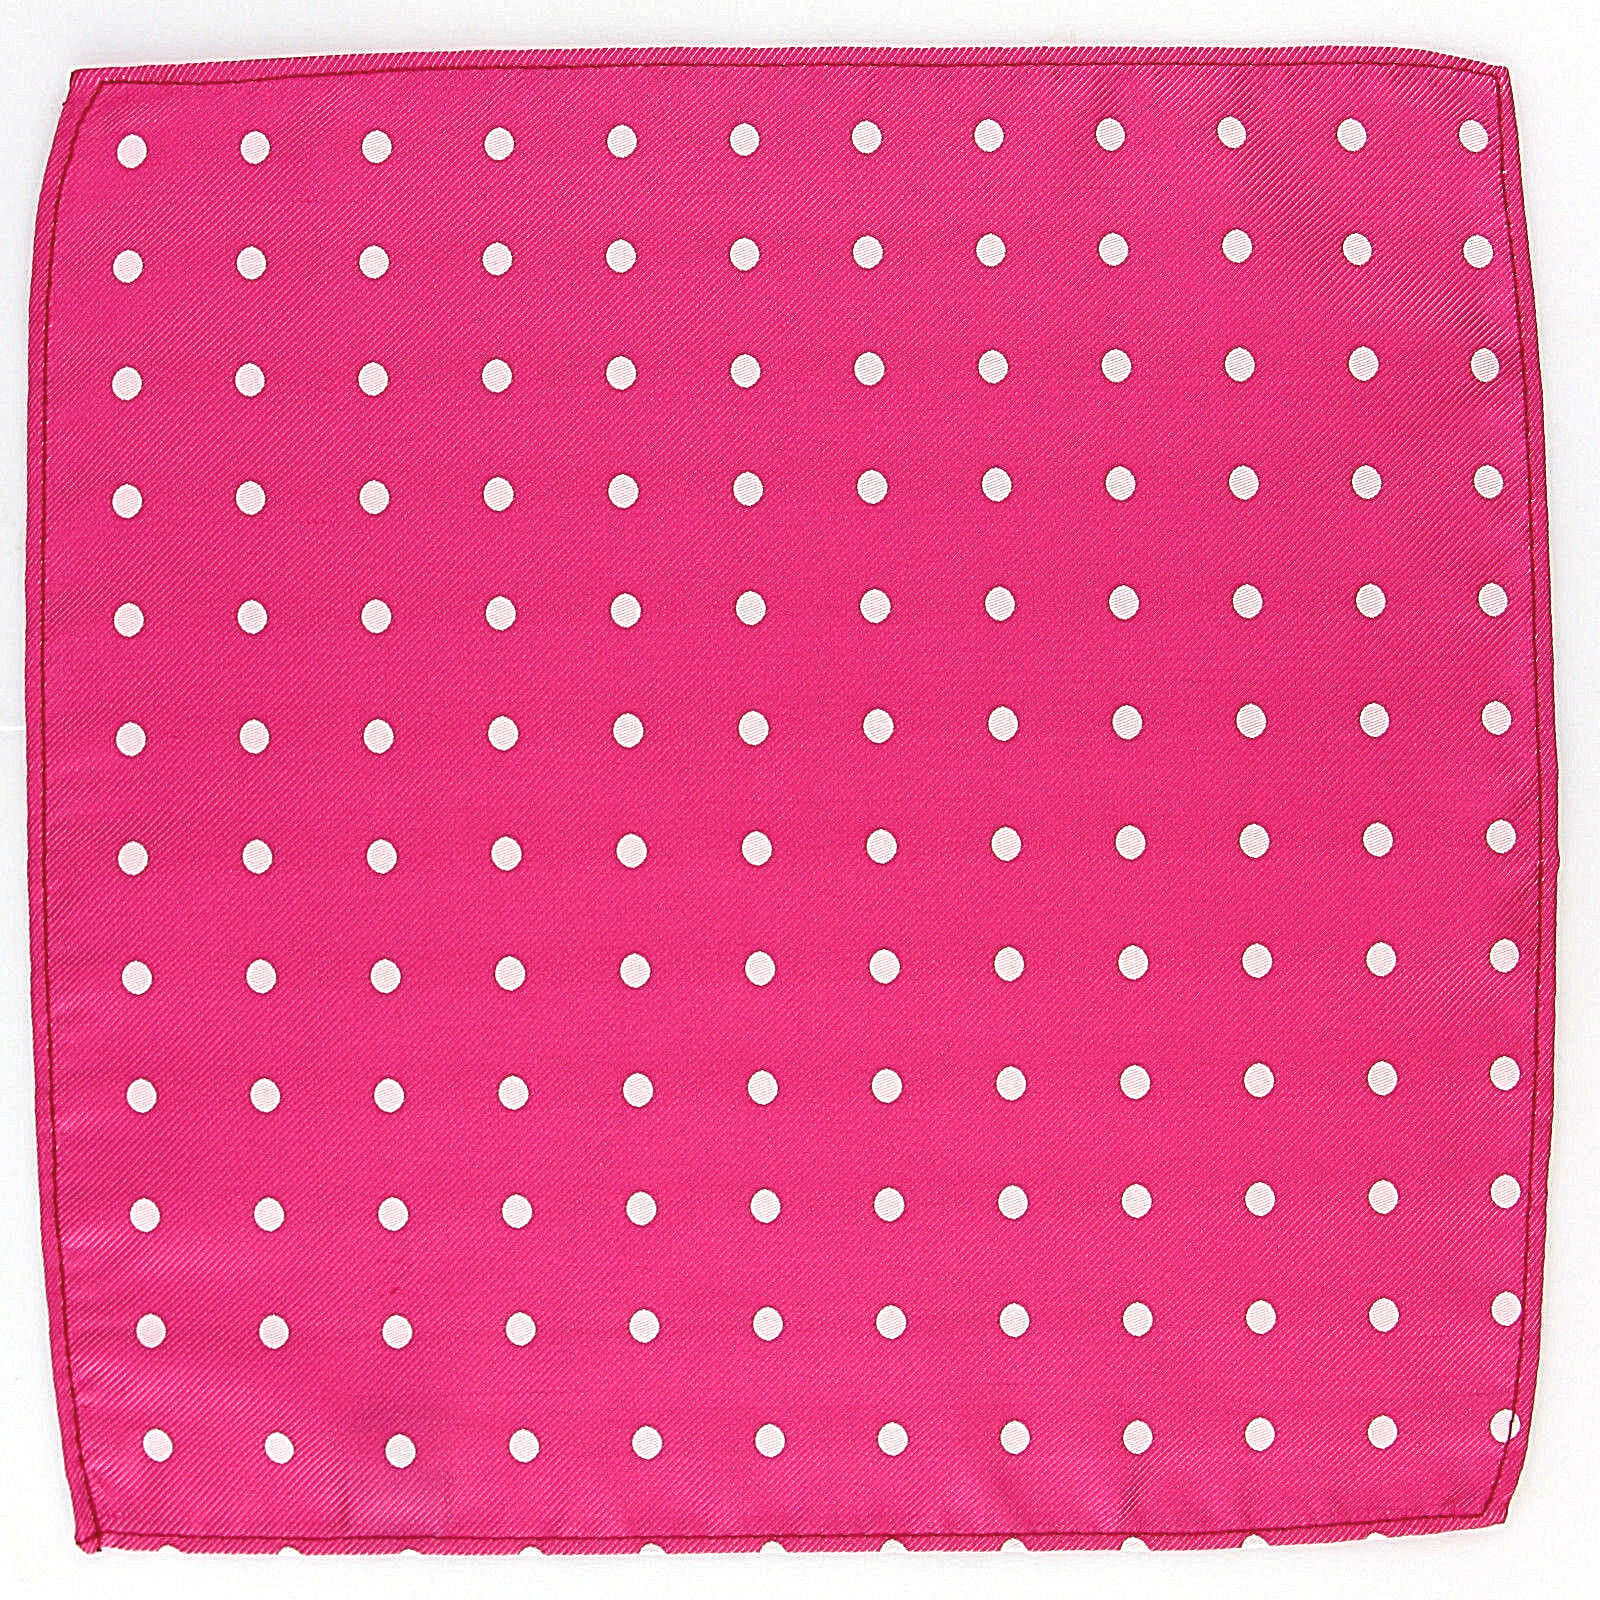 "Men's Pocket Square Polka Dot 10"" Dress Fashion Handkerchief Hot Pink Hanky"